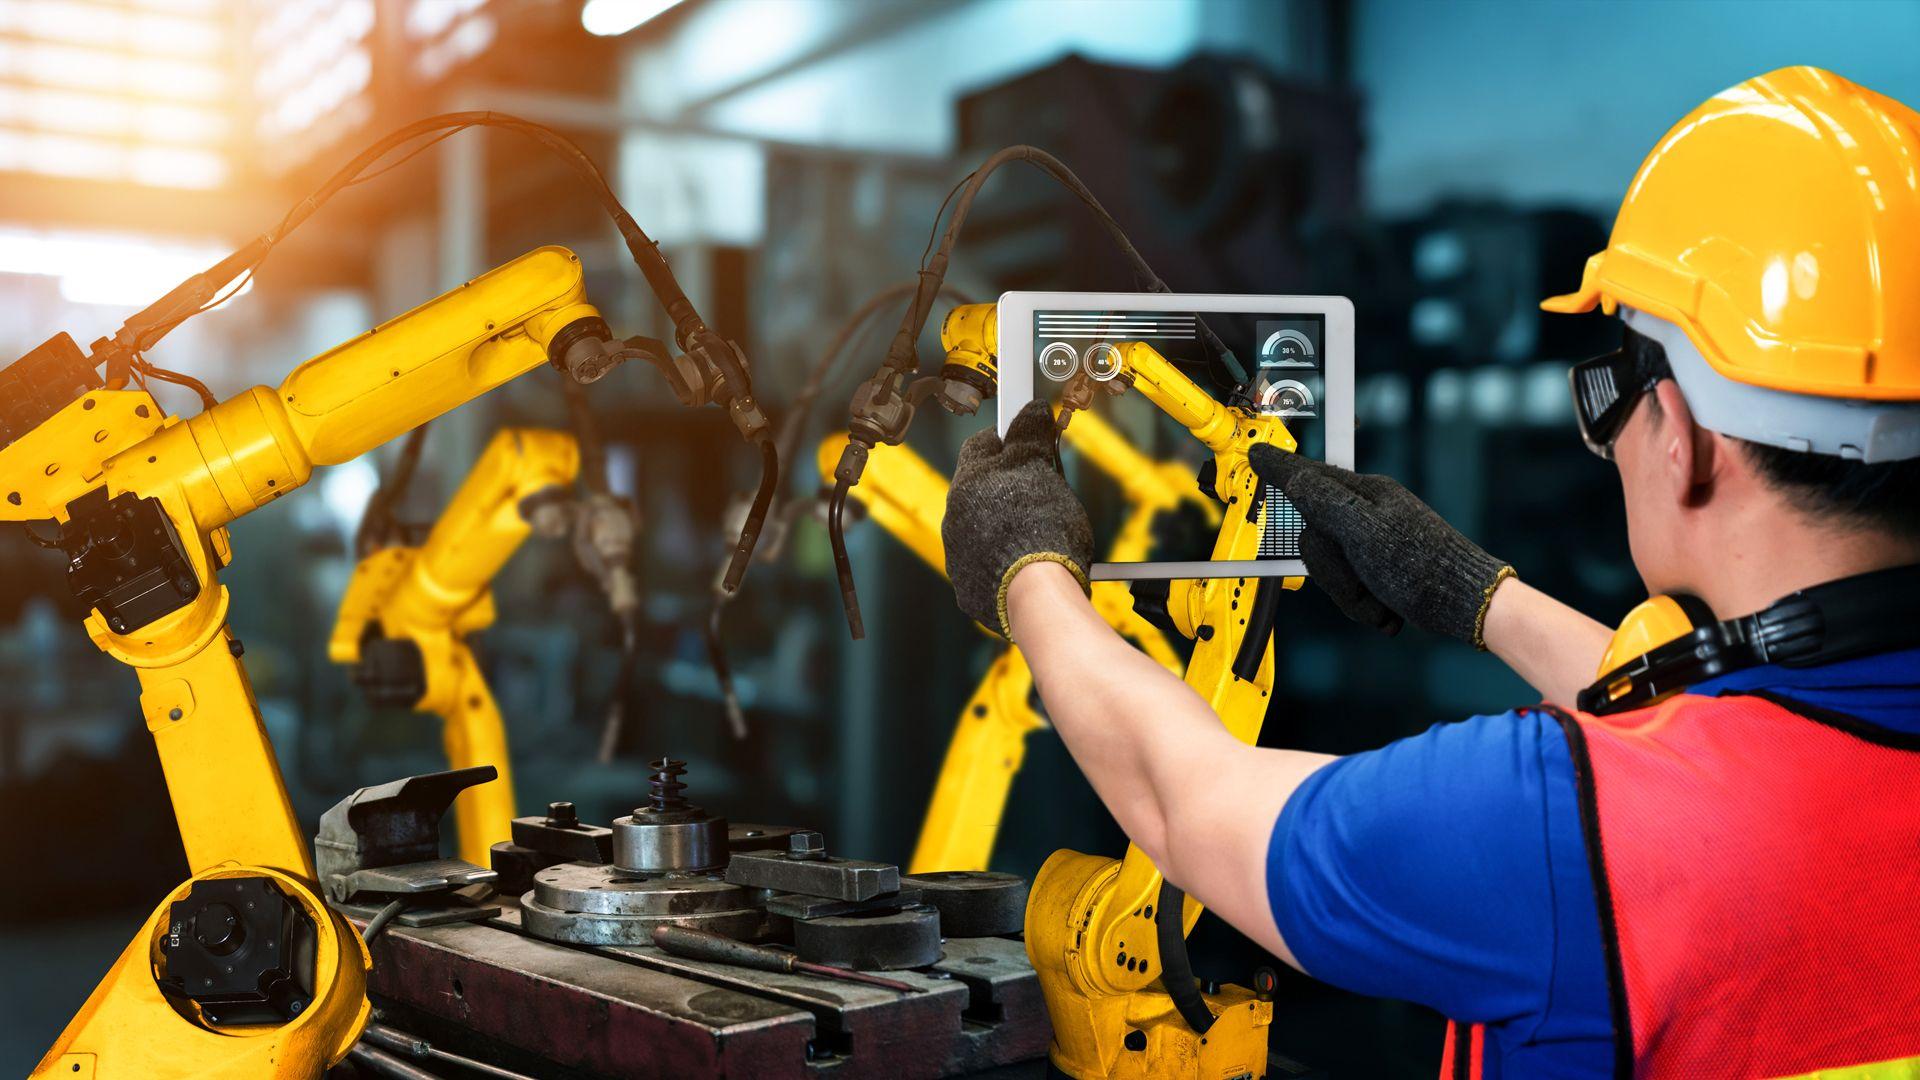 Becoming a Smarter Manufacturer